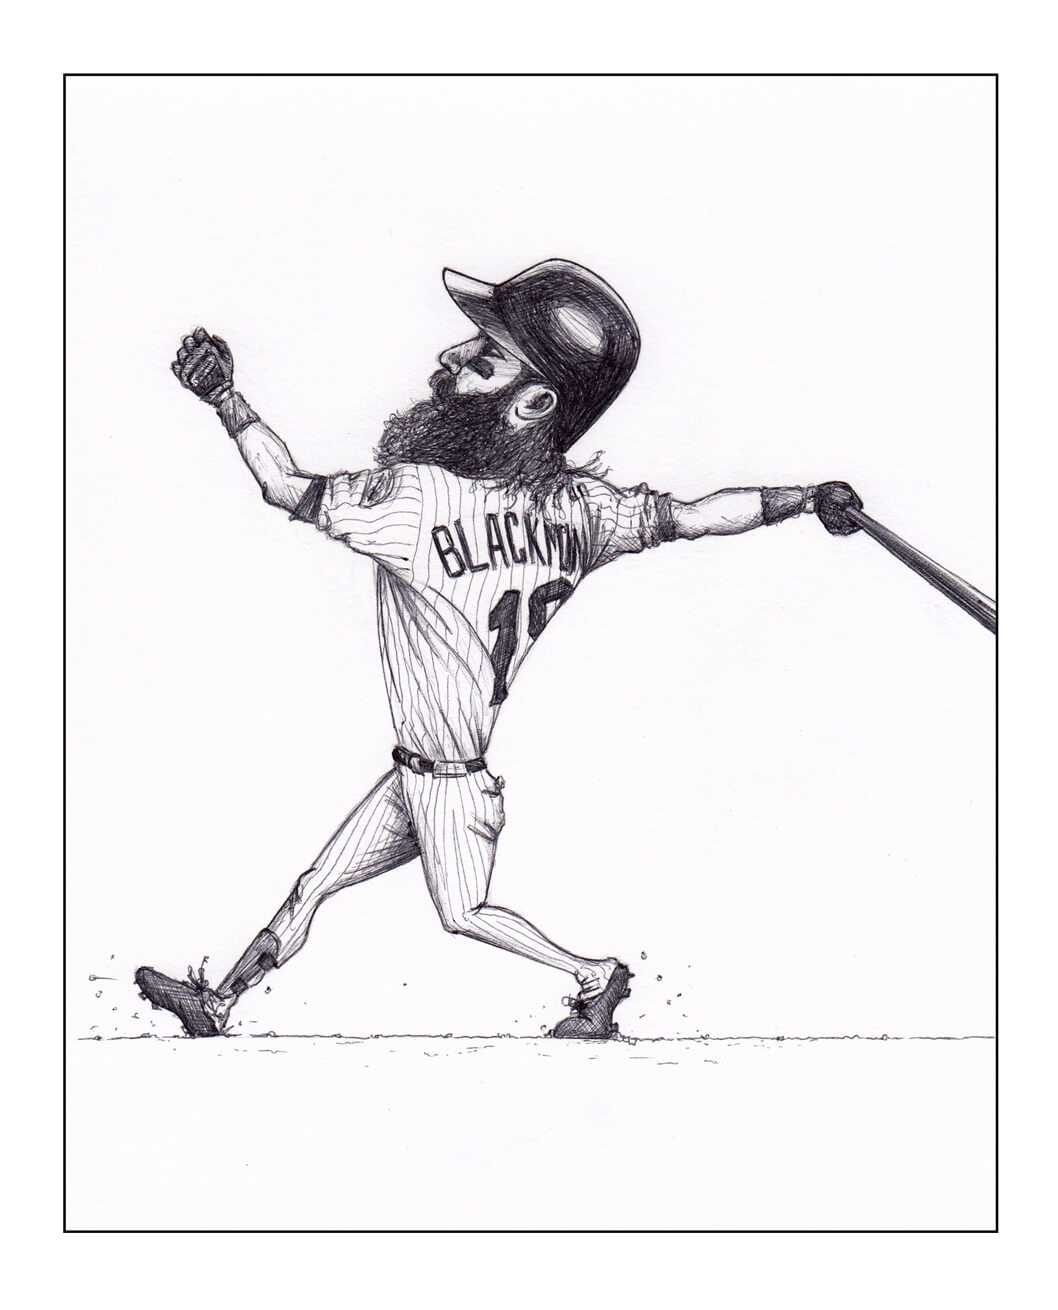 sketch of charlie blackmon